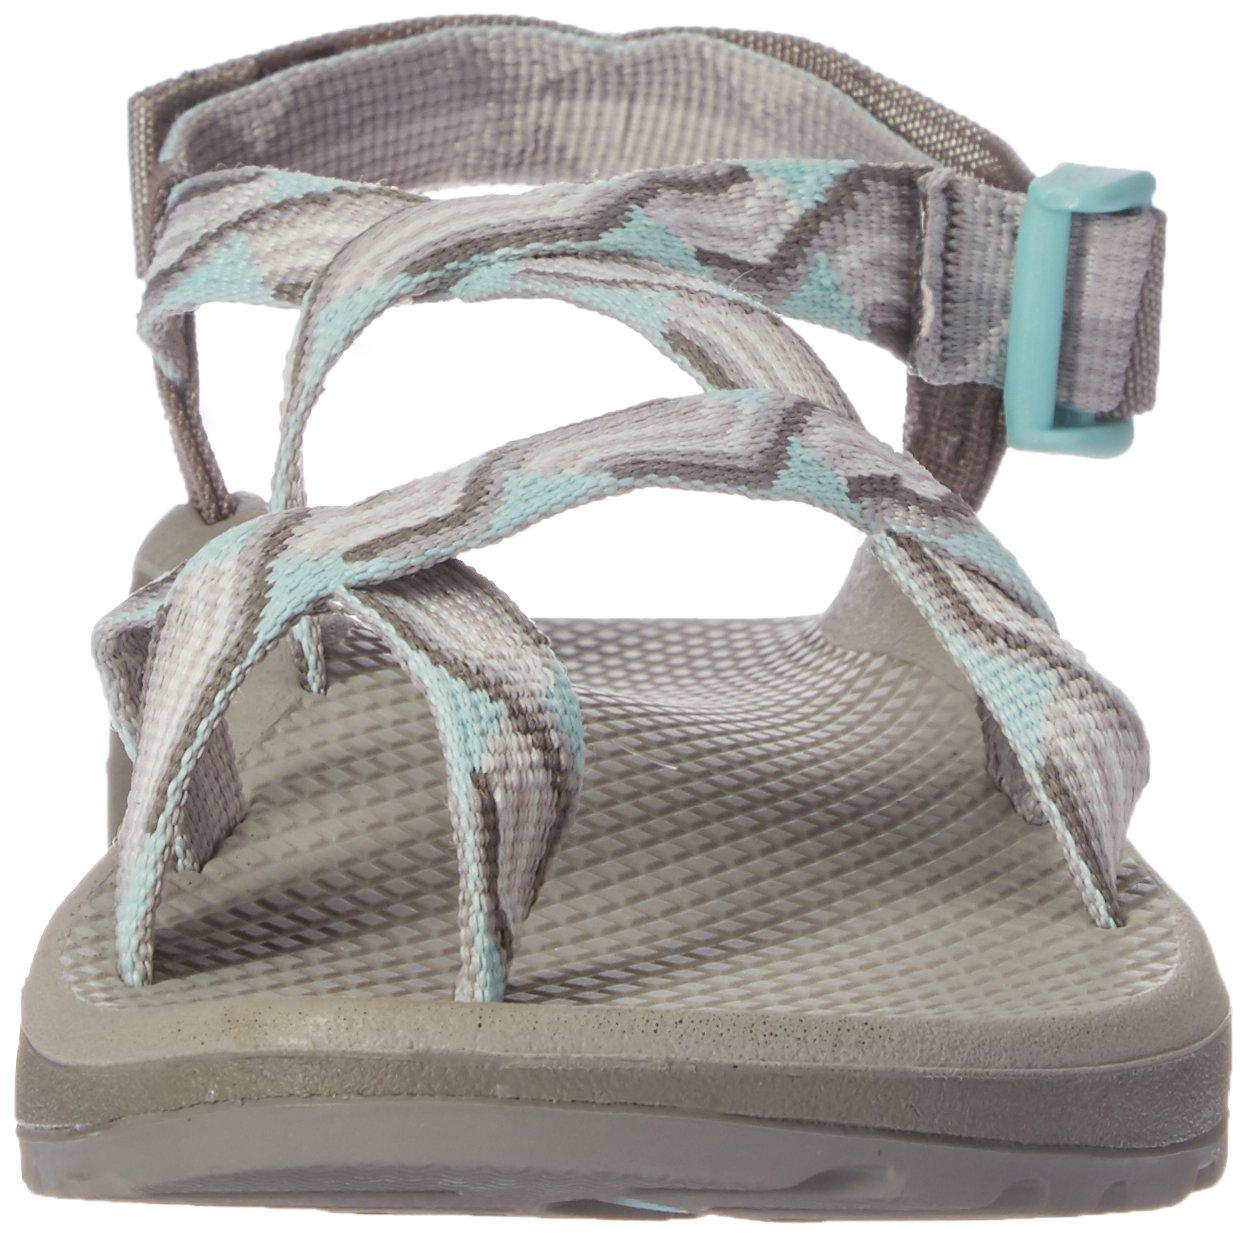 01b3ef23b9fb ... Chaco Women s Zcloud 2 Athletic Sandal Sandal Sandal B01H4XBW3Y 8 M  US